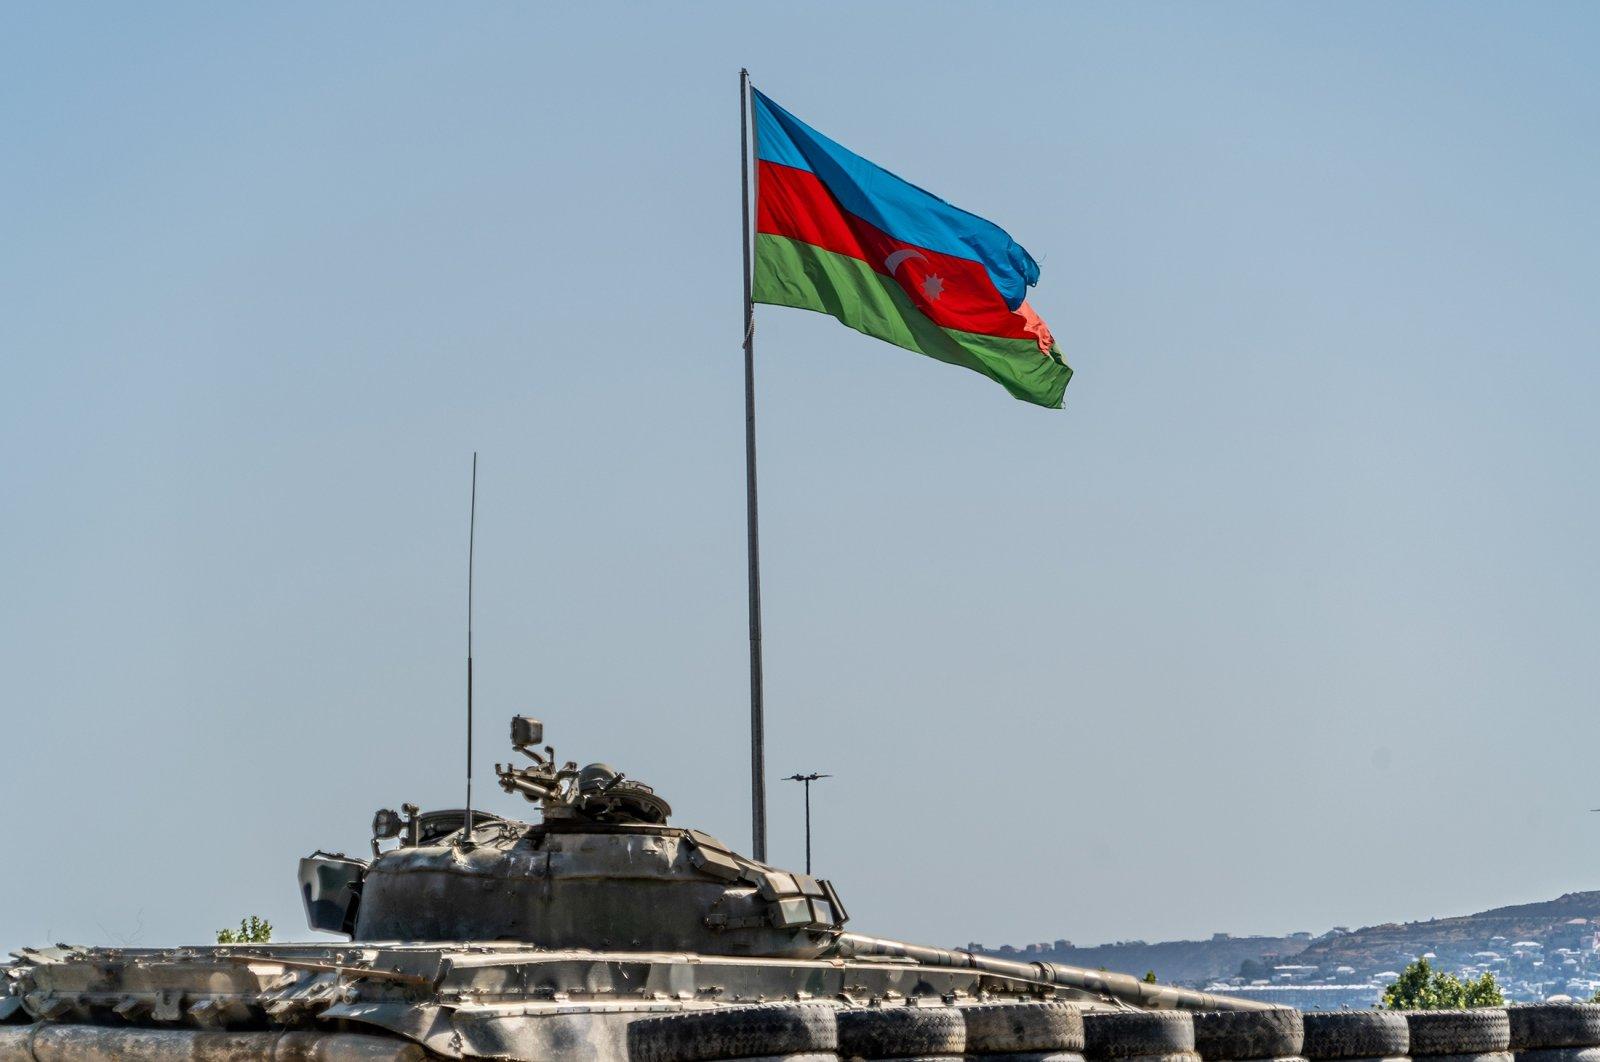 Azerbaijan flag flying above a captured Armenian tank in Trophy Park, Baku, Azerbaijan, June 16, 2021 (Getty Images)